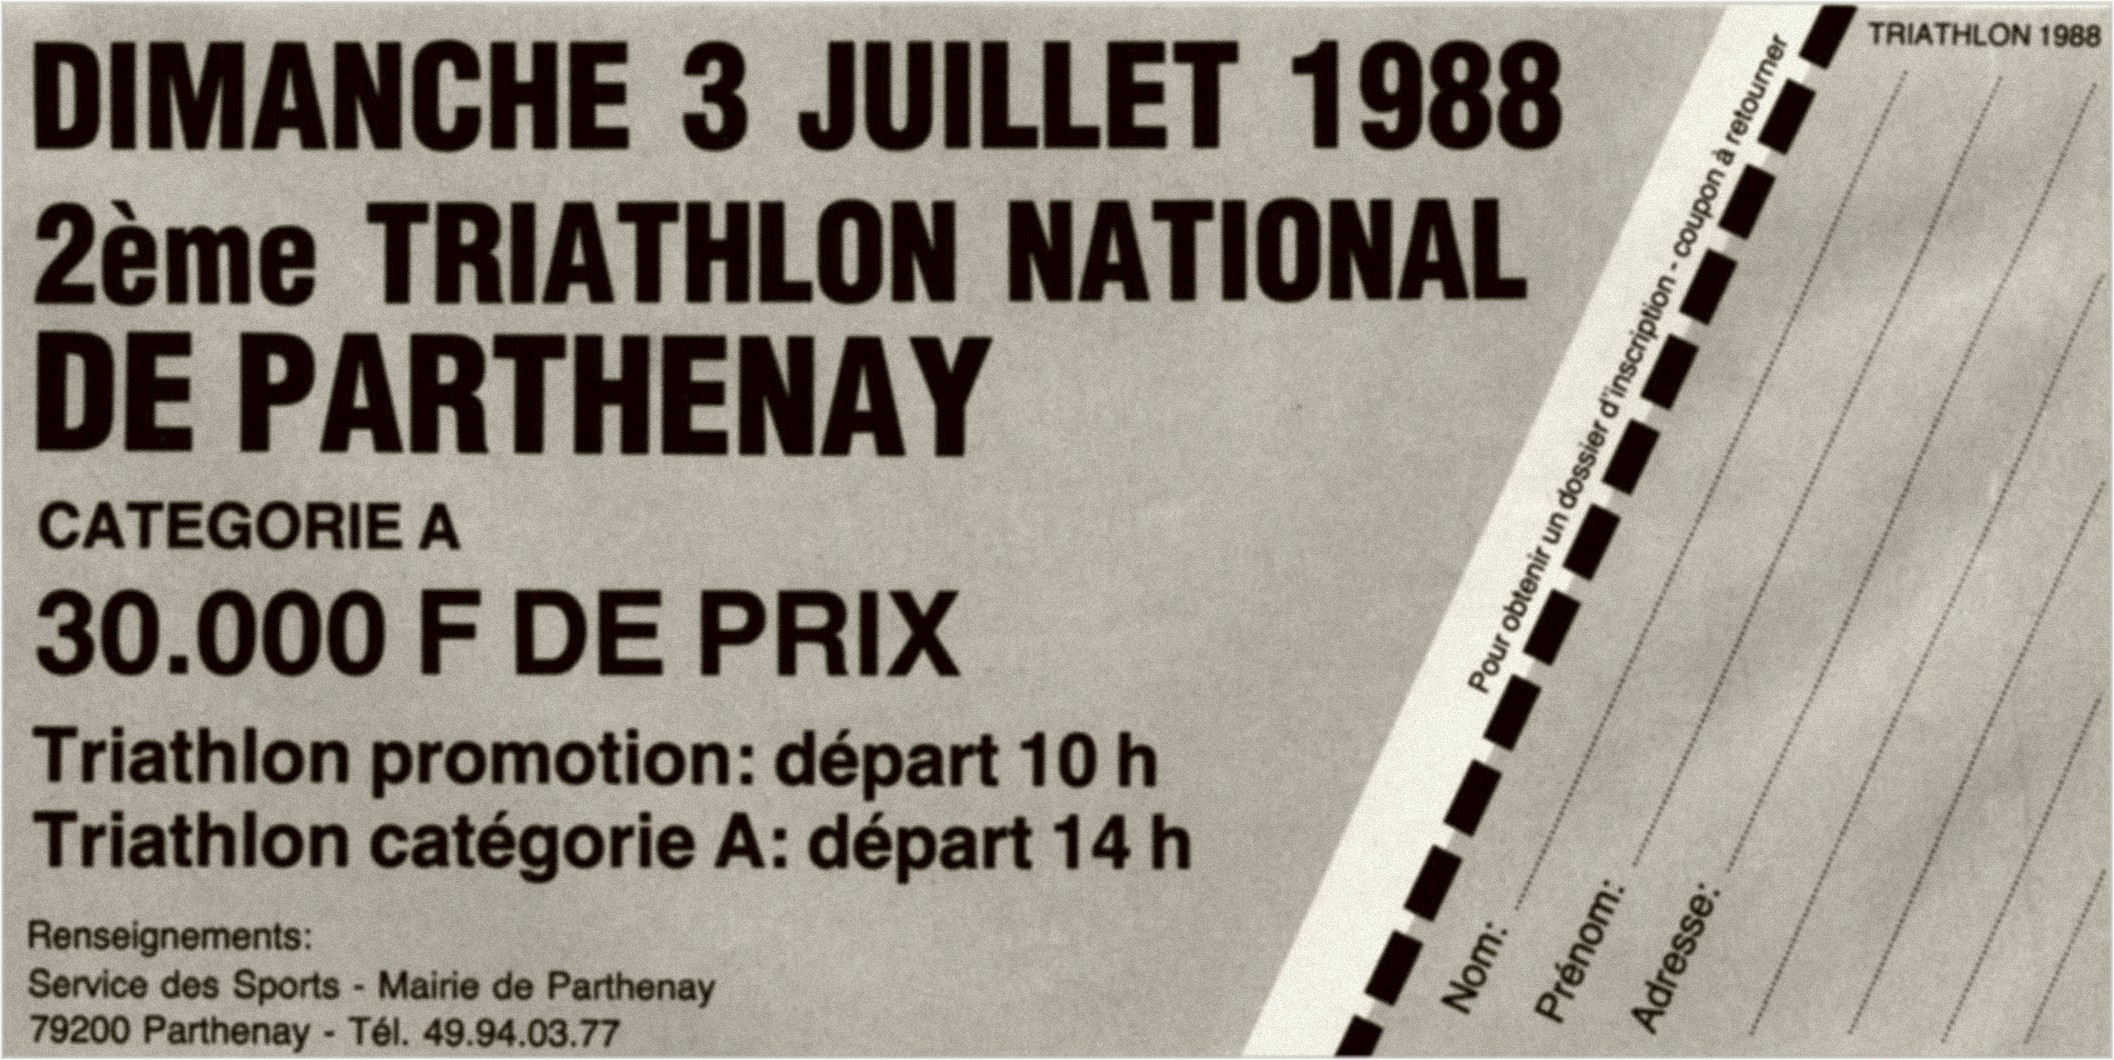 img963_03-07-1988_parthenay